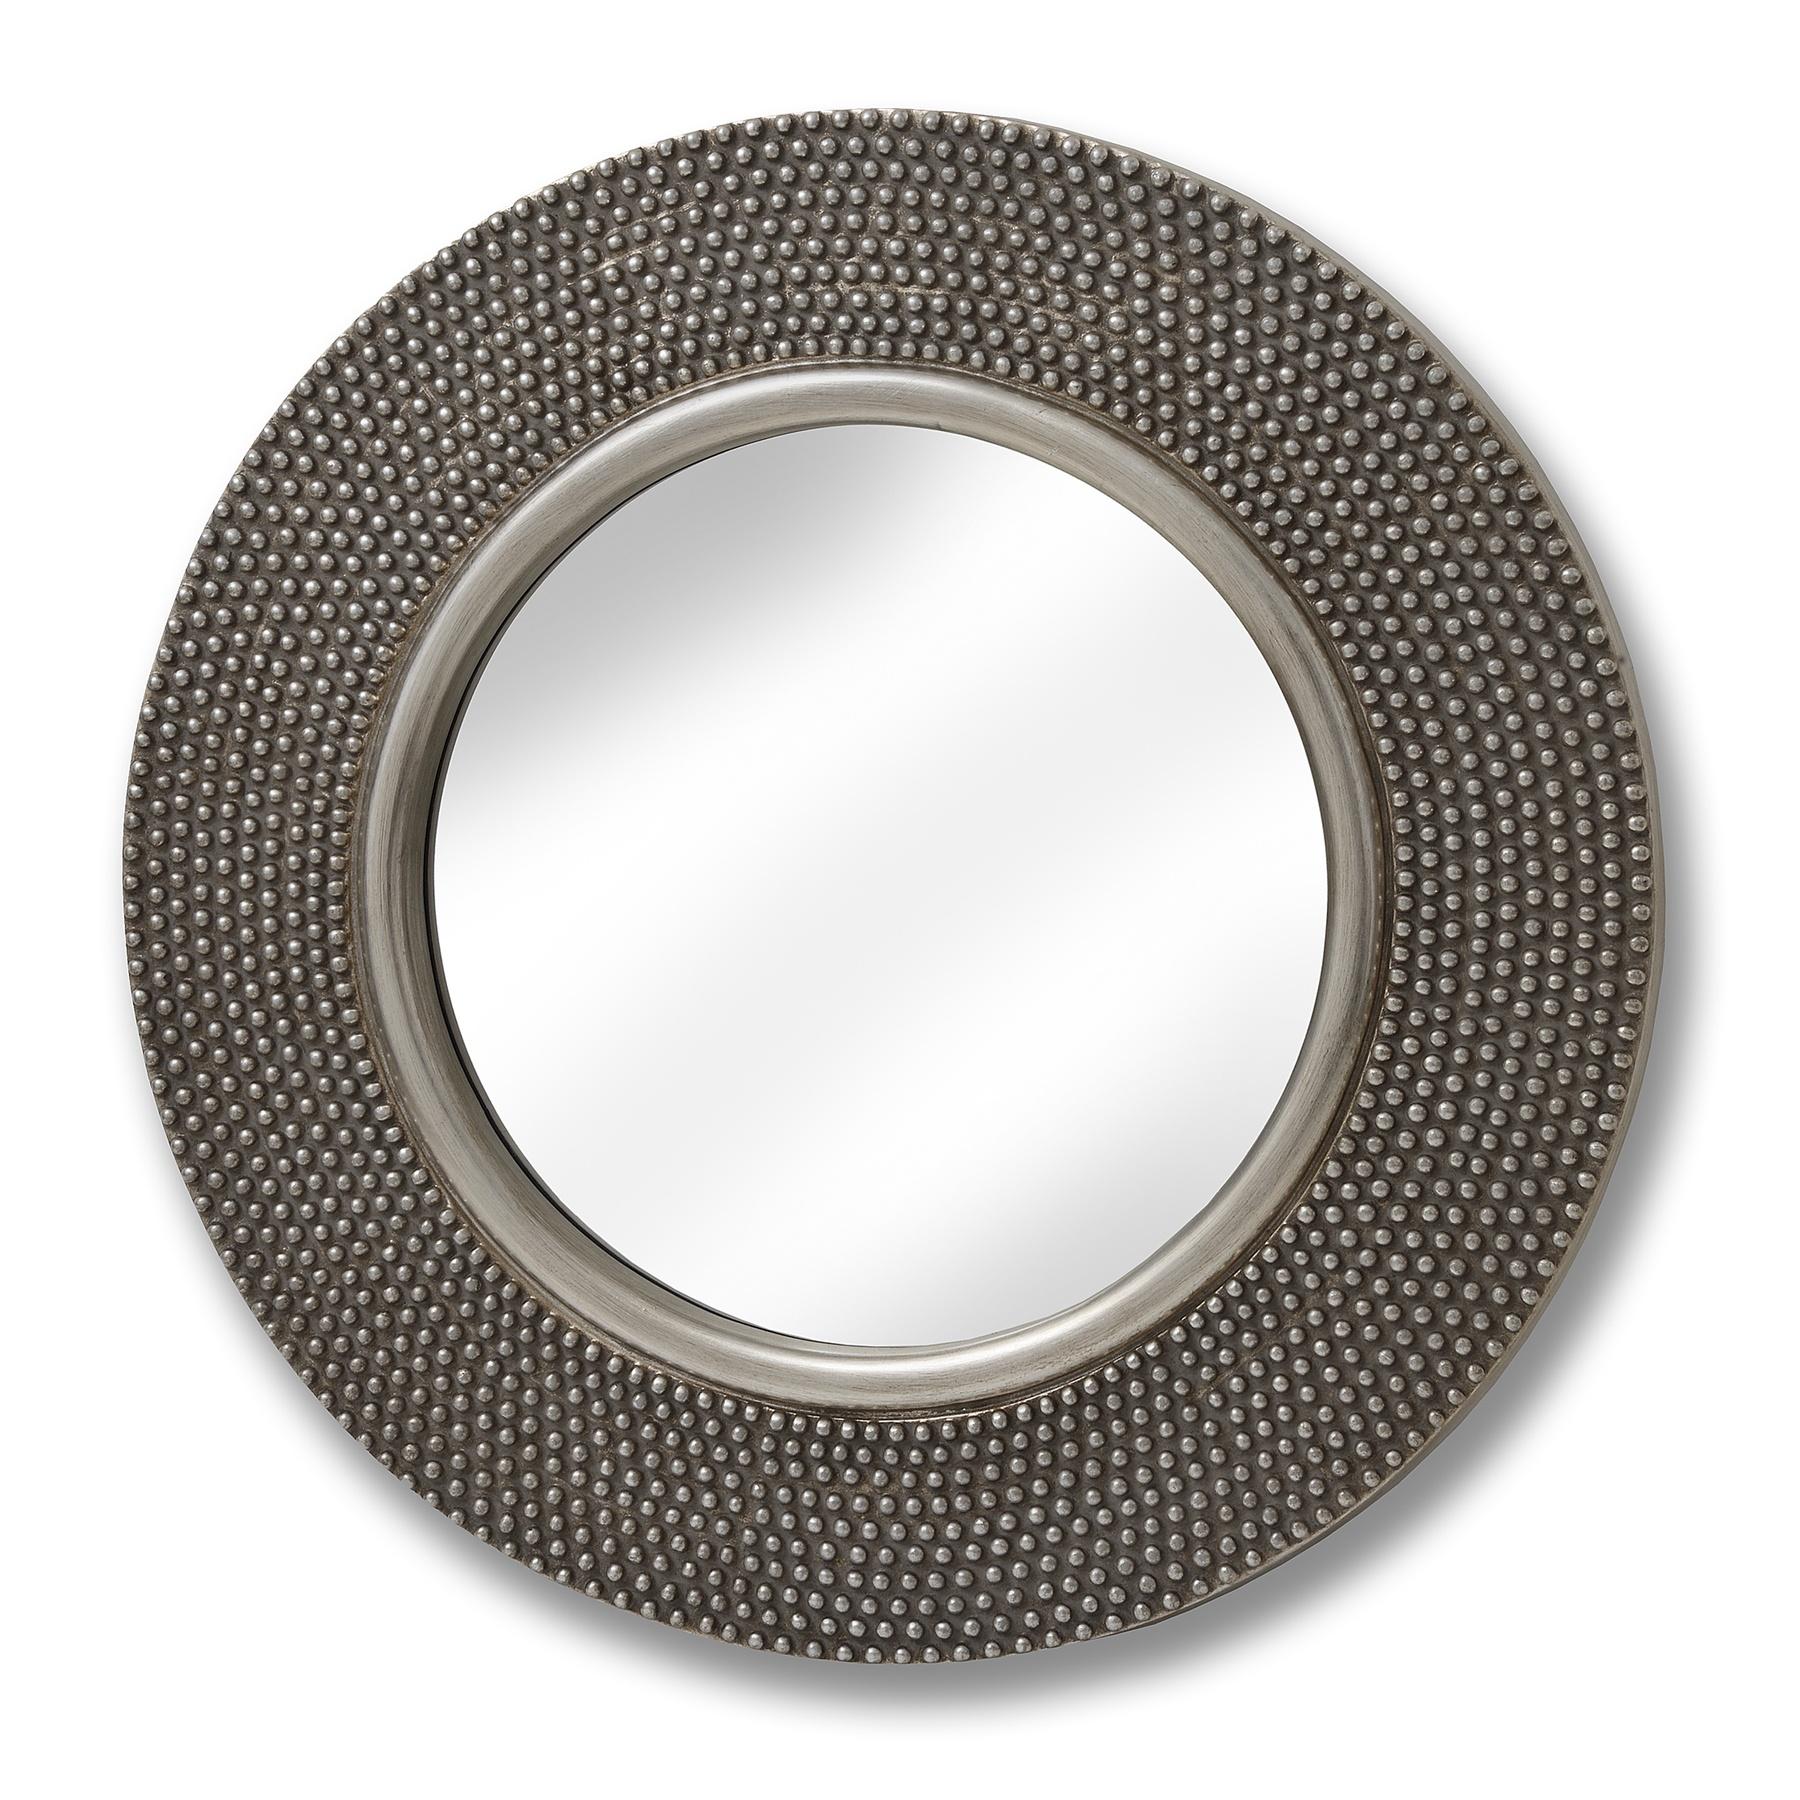 Large Circular Beaded Mirror